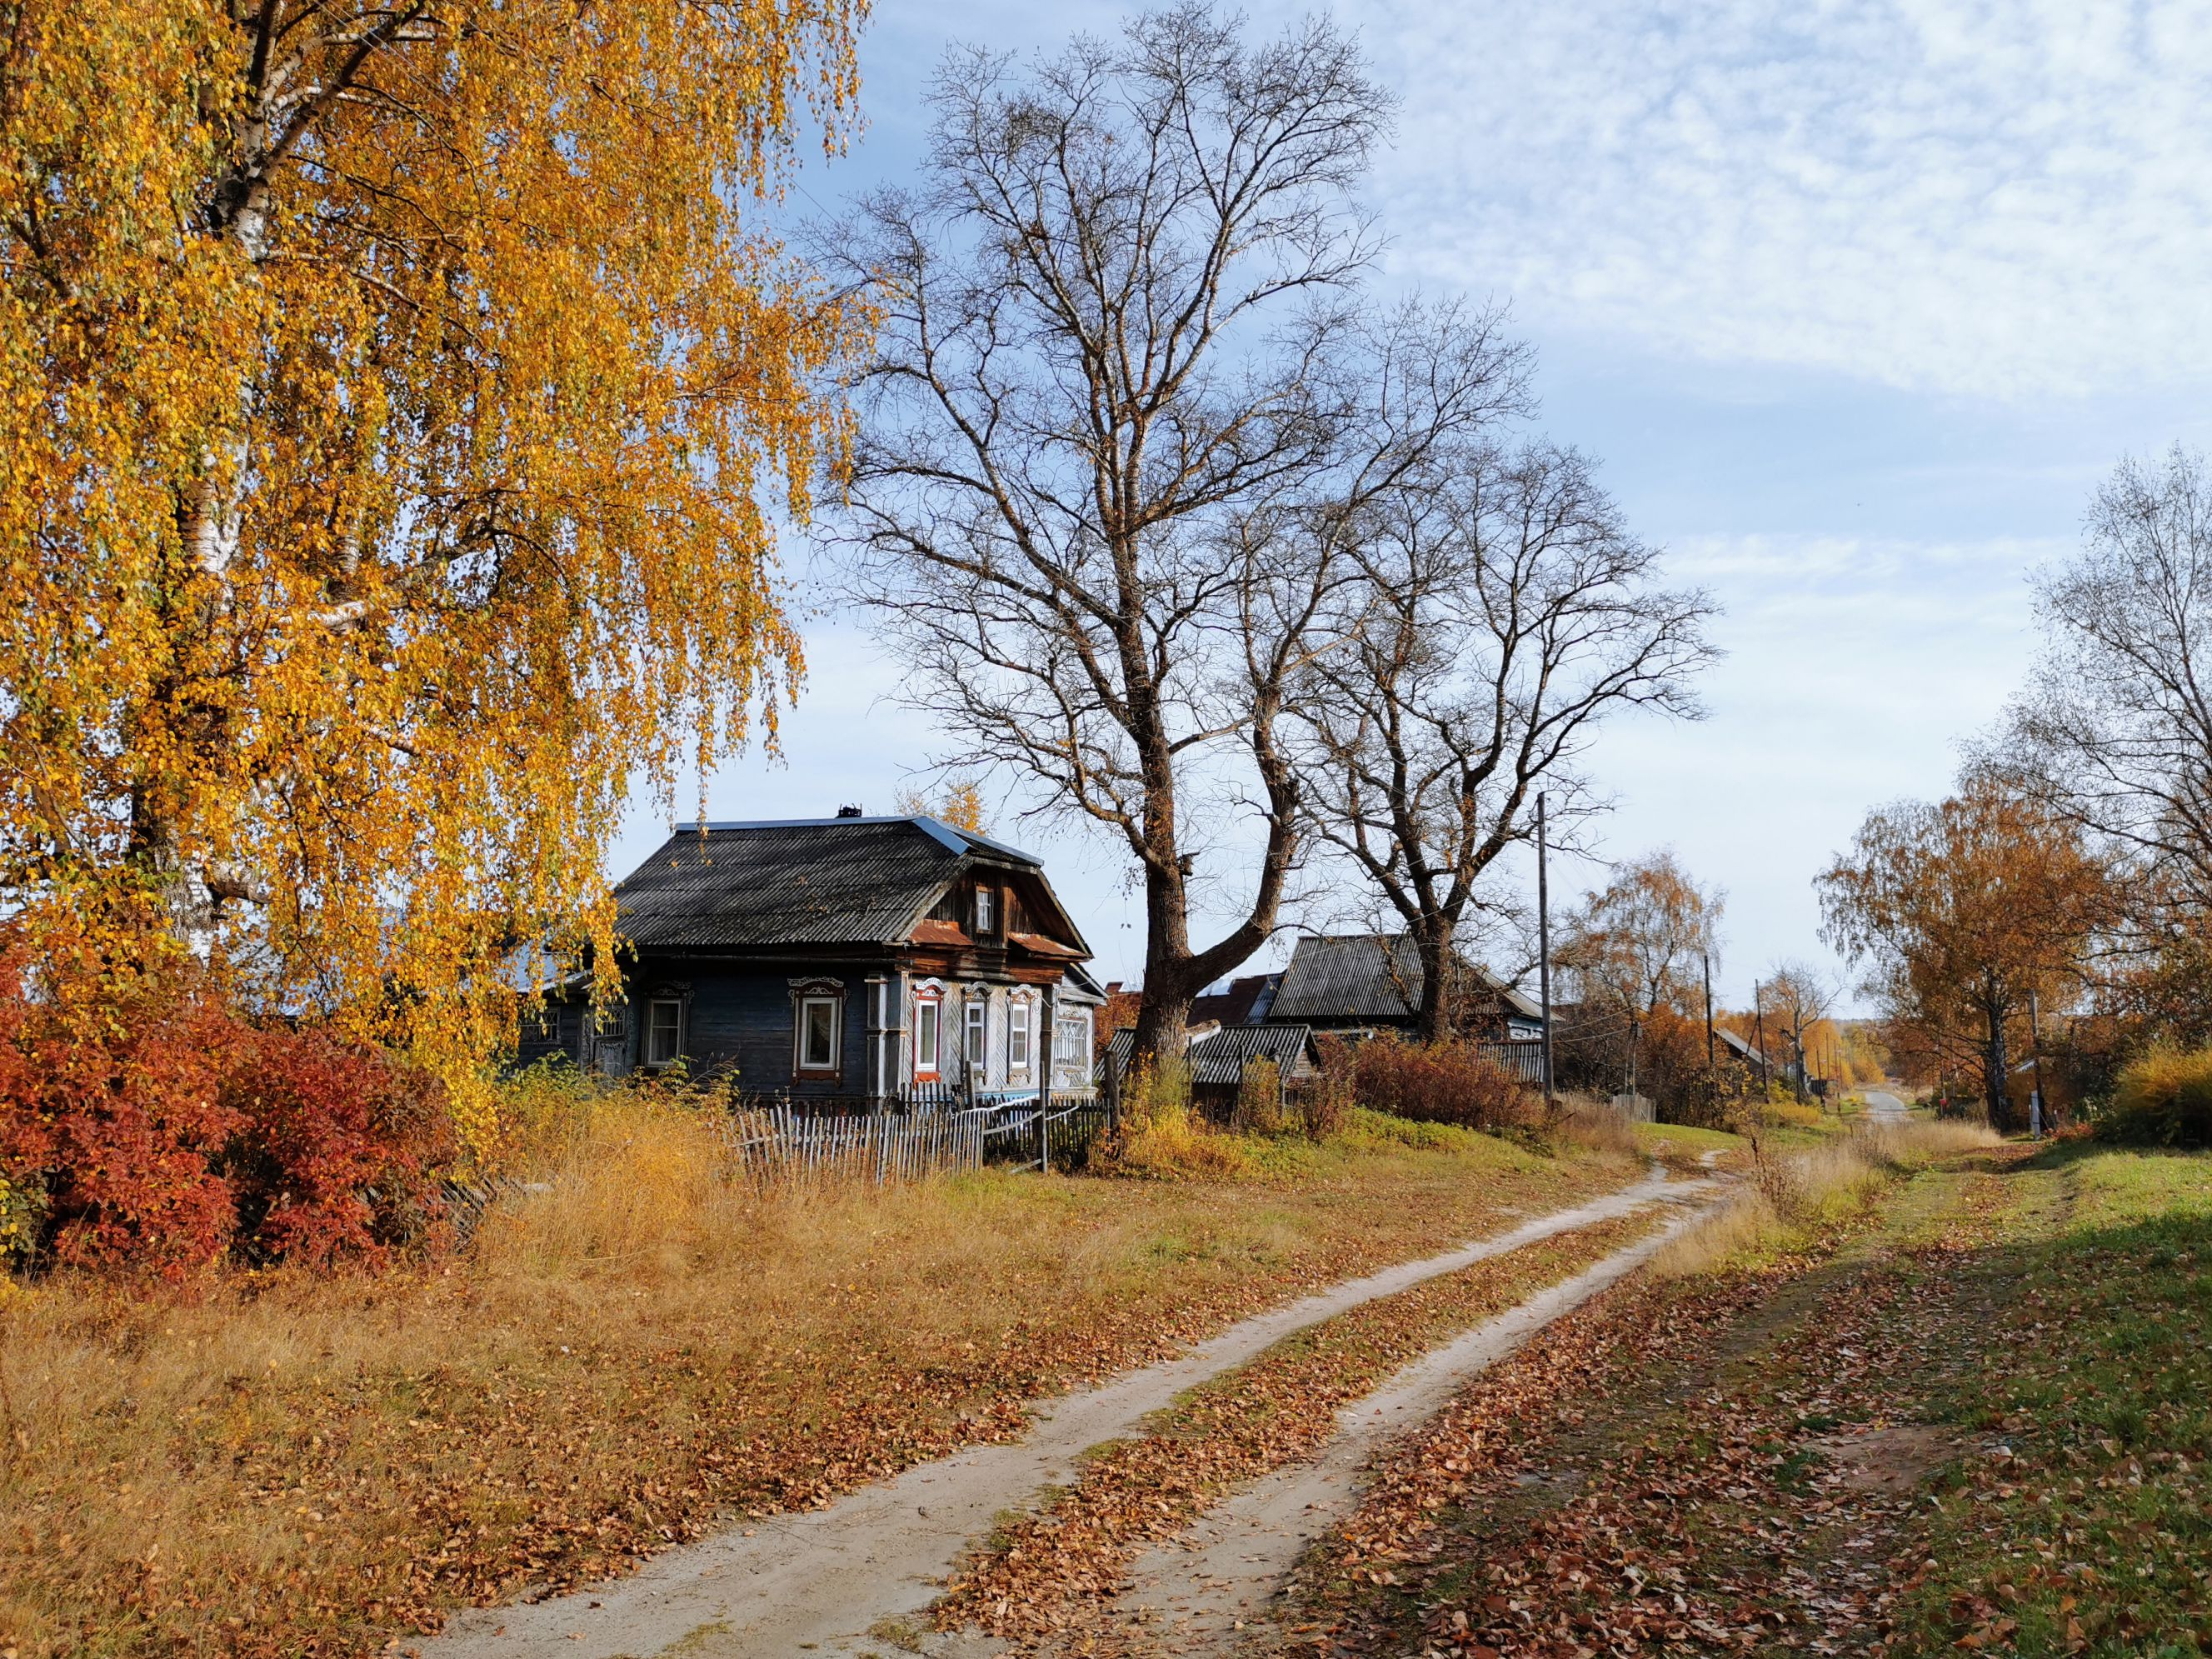 derevnya-kamenka-vetluzhskij-rajon